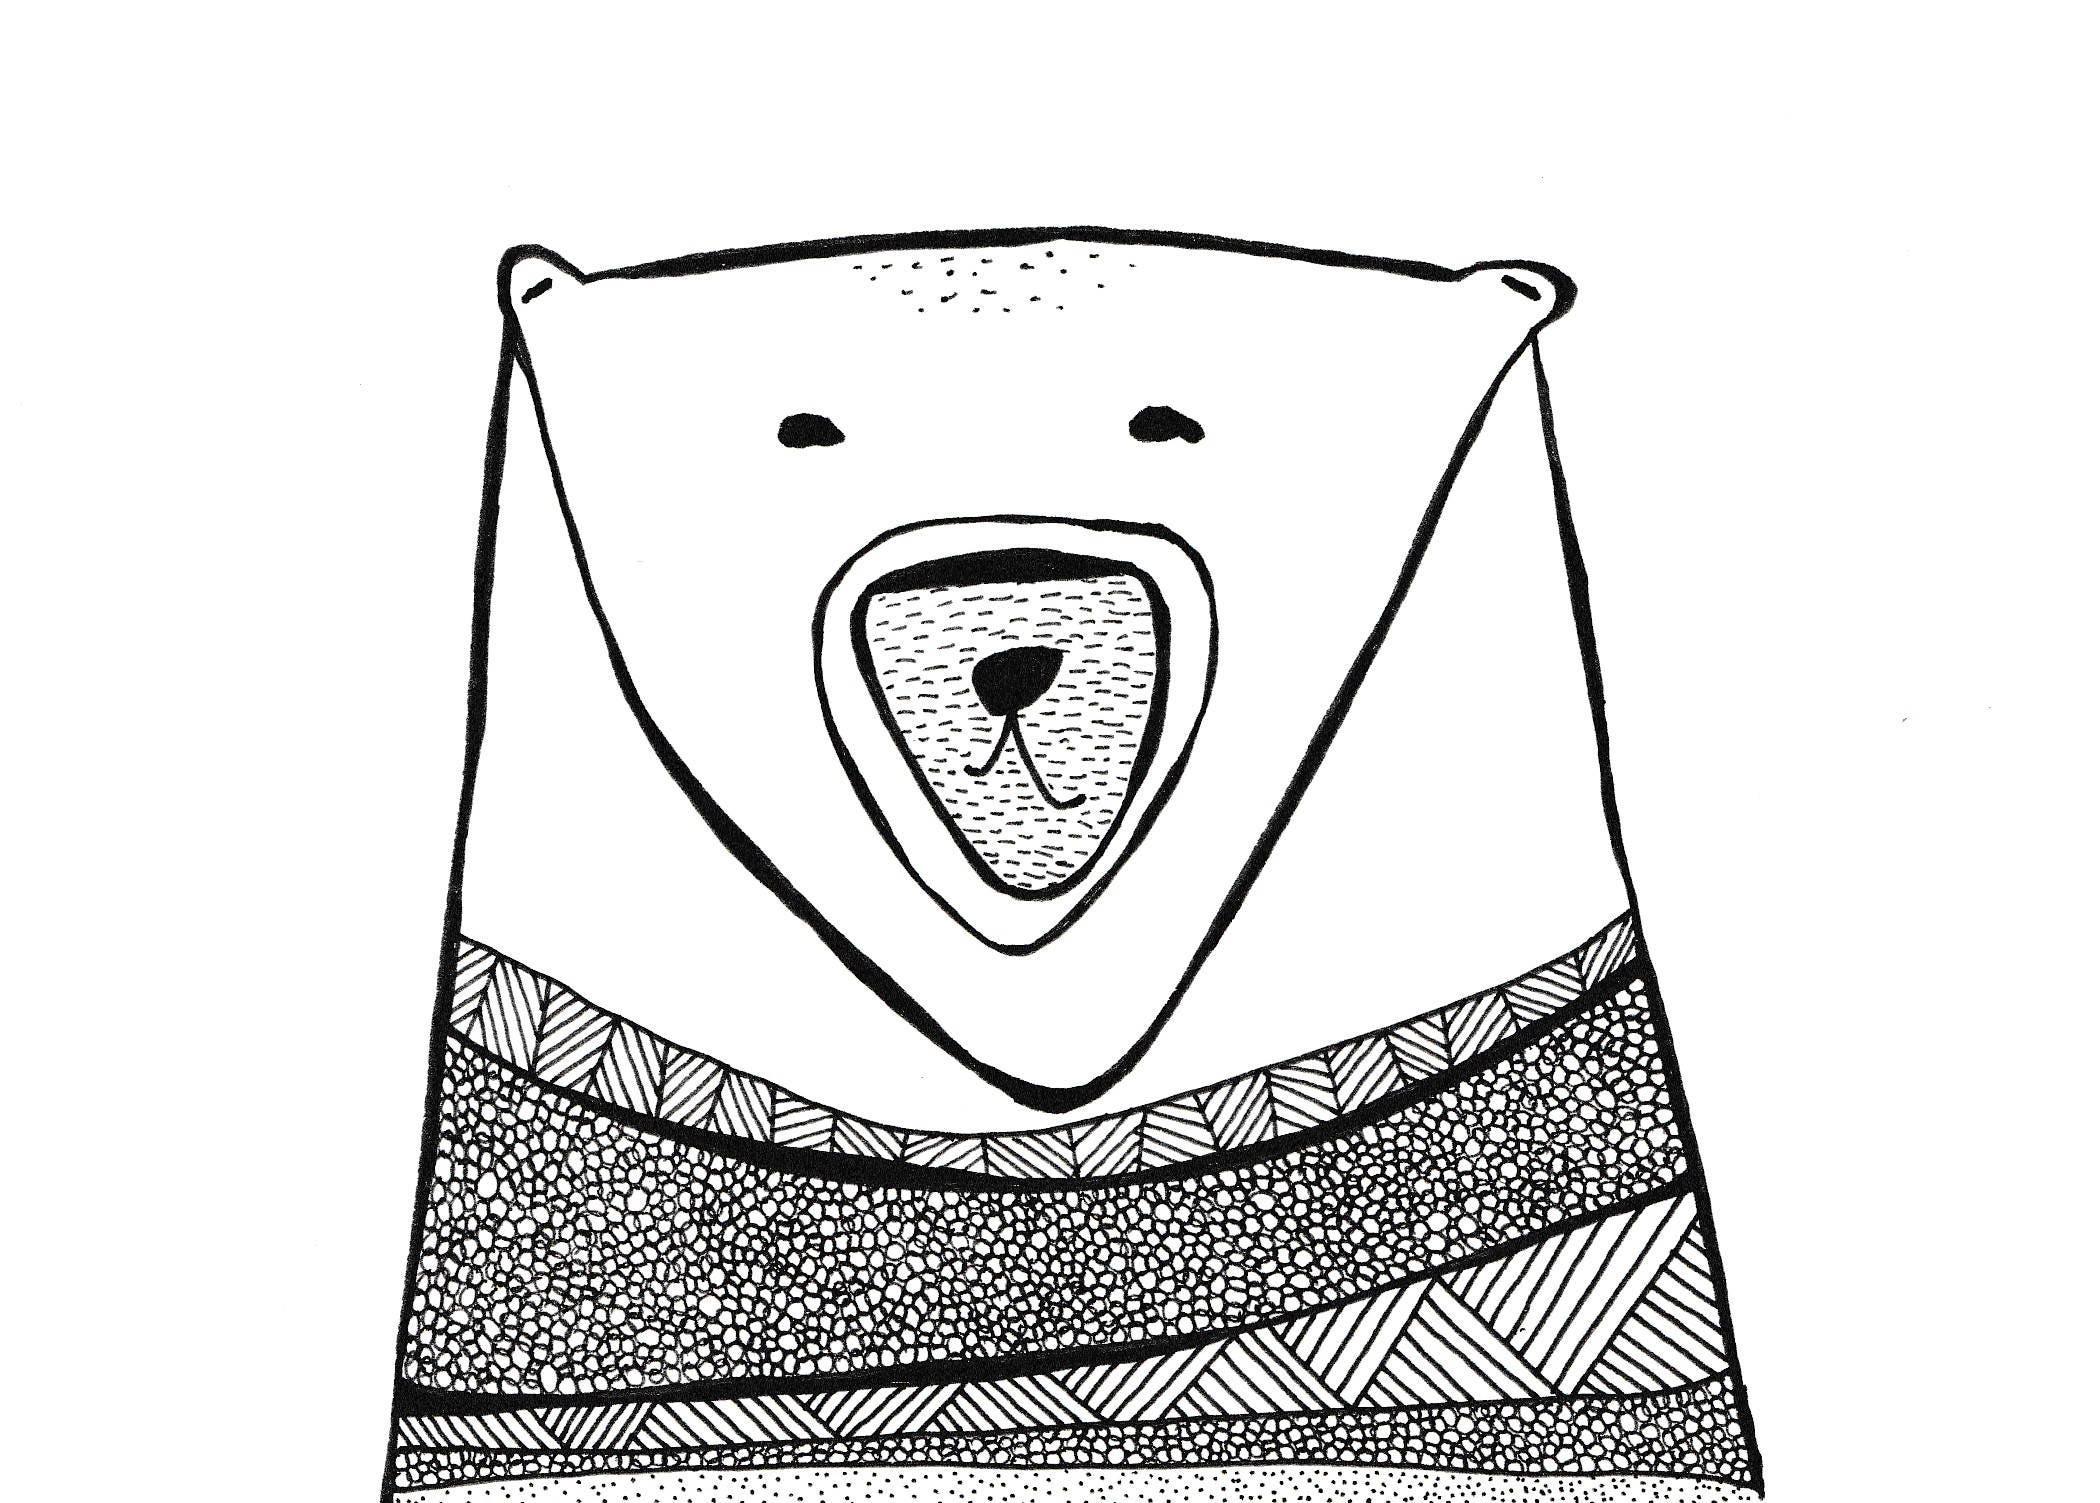 custom polar bear drawing hygge modern original new nordic